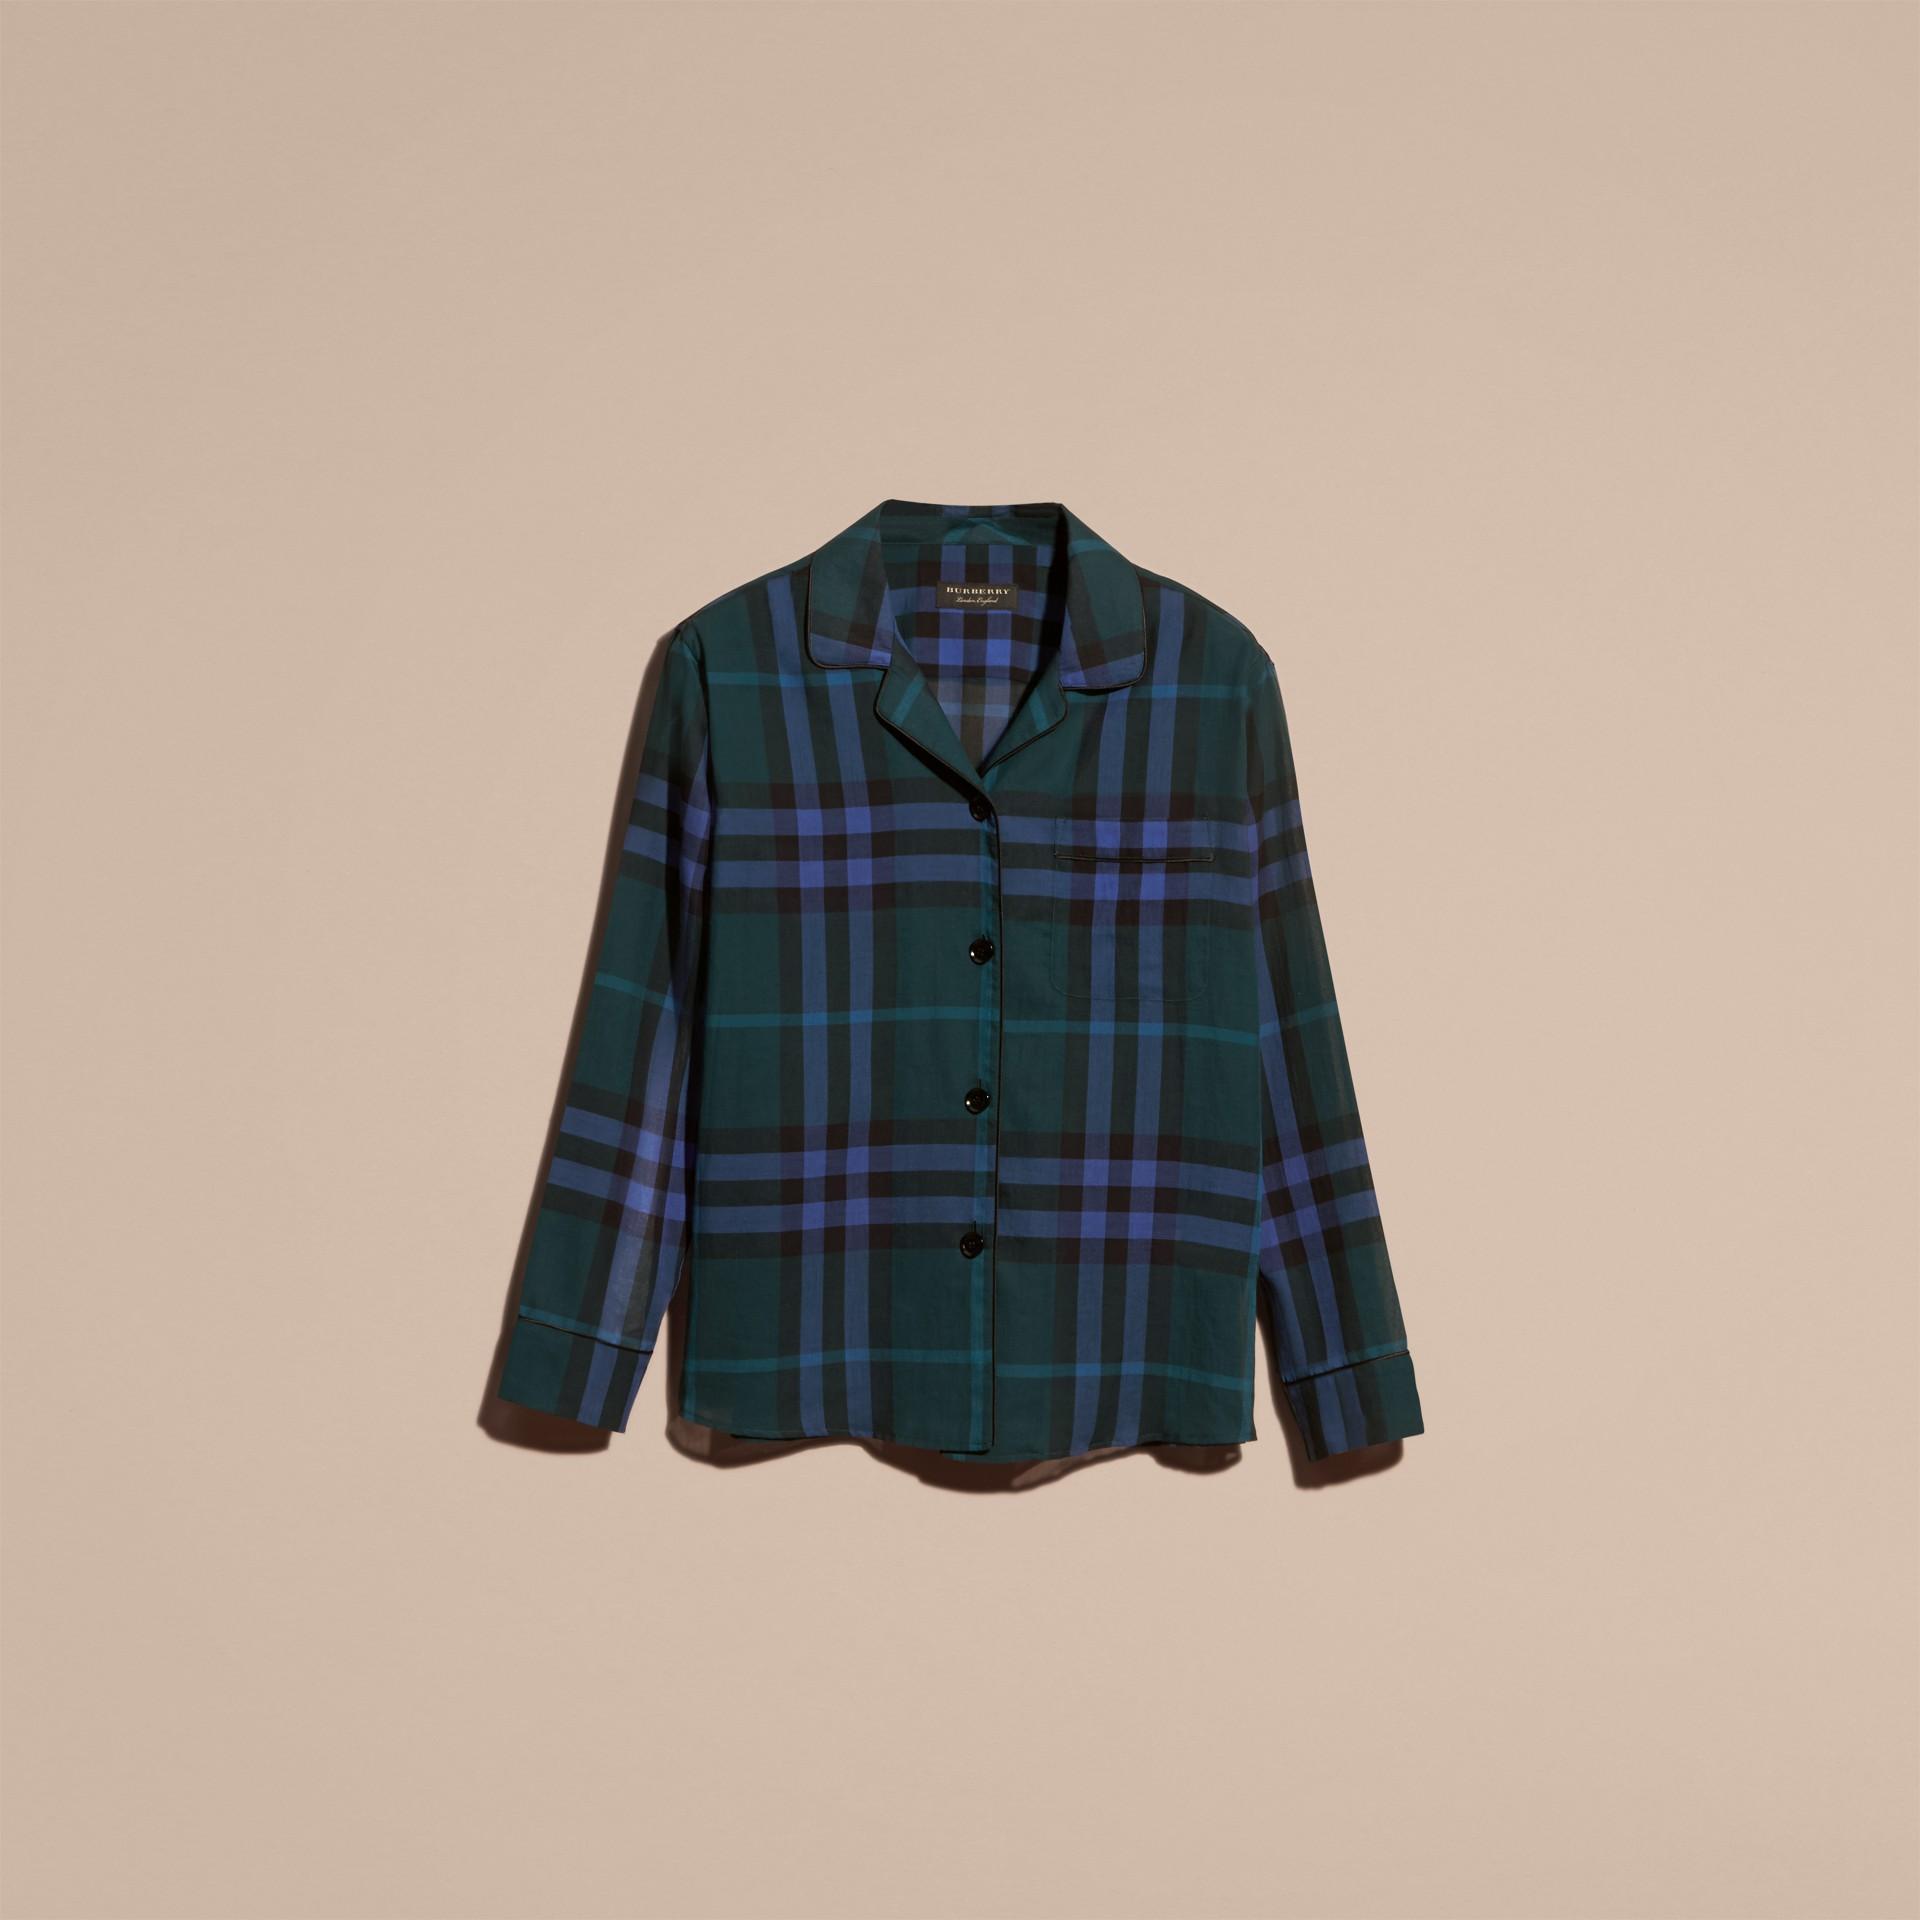 Dark teal Check Cotton Pyjama-style Shirt Dark Teal - gallery image 4